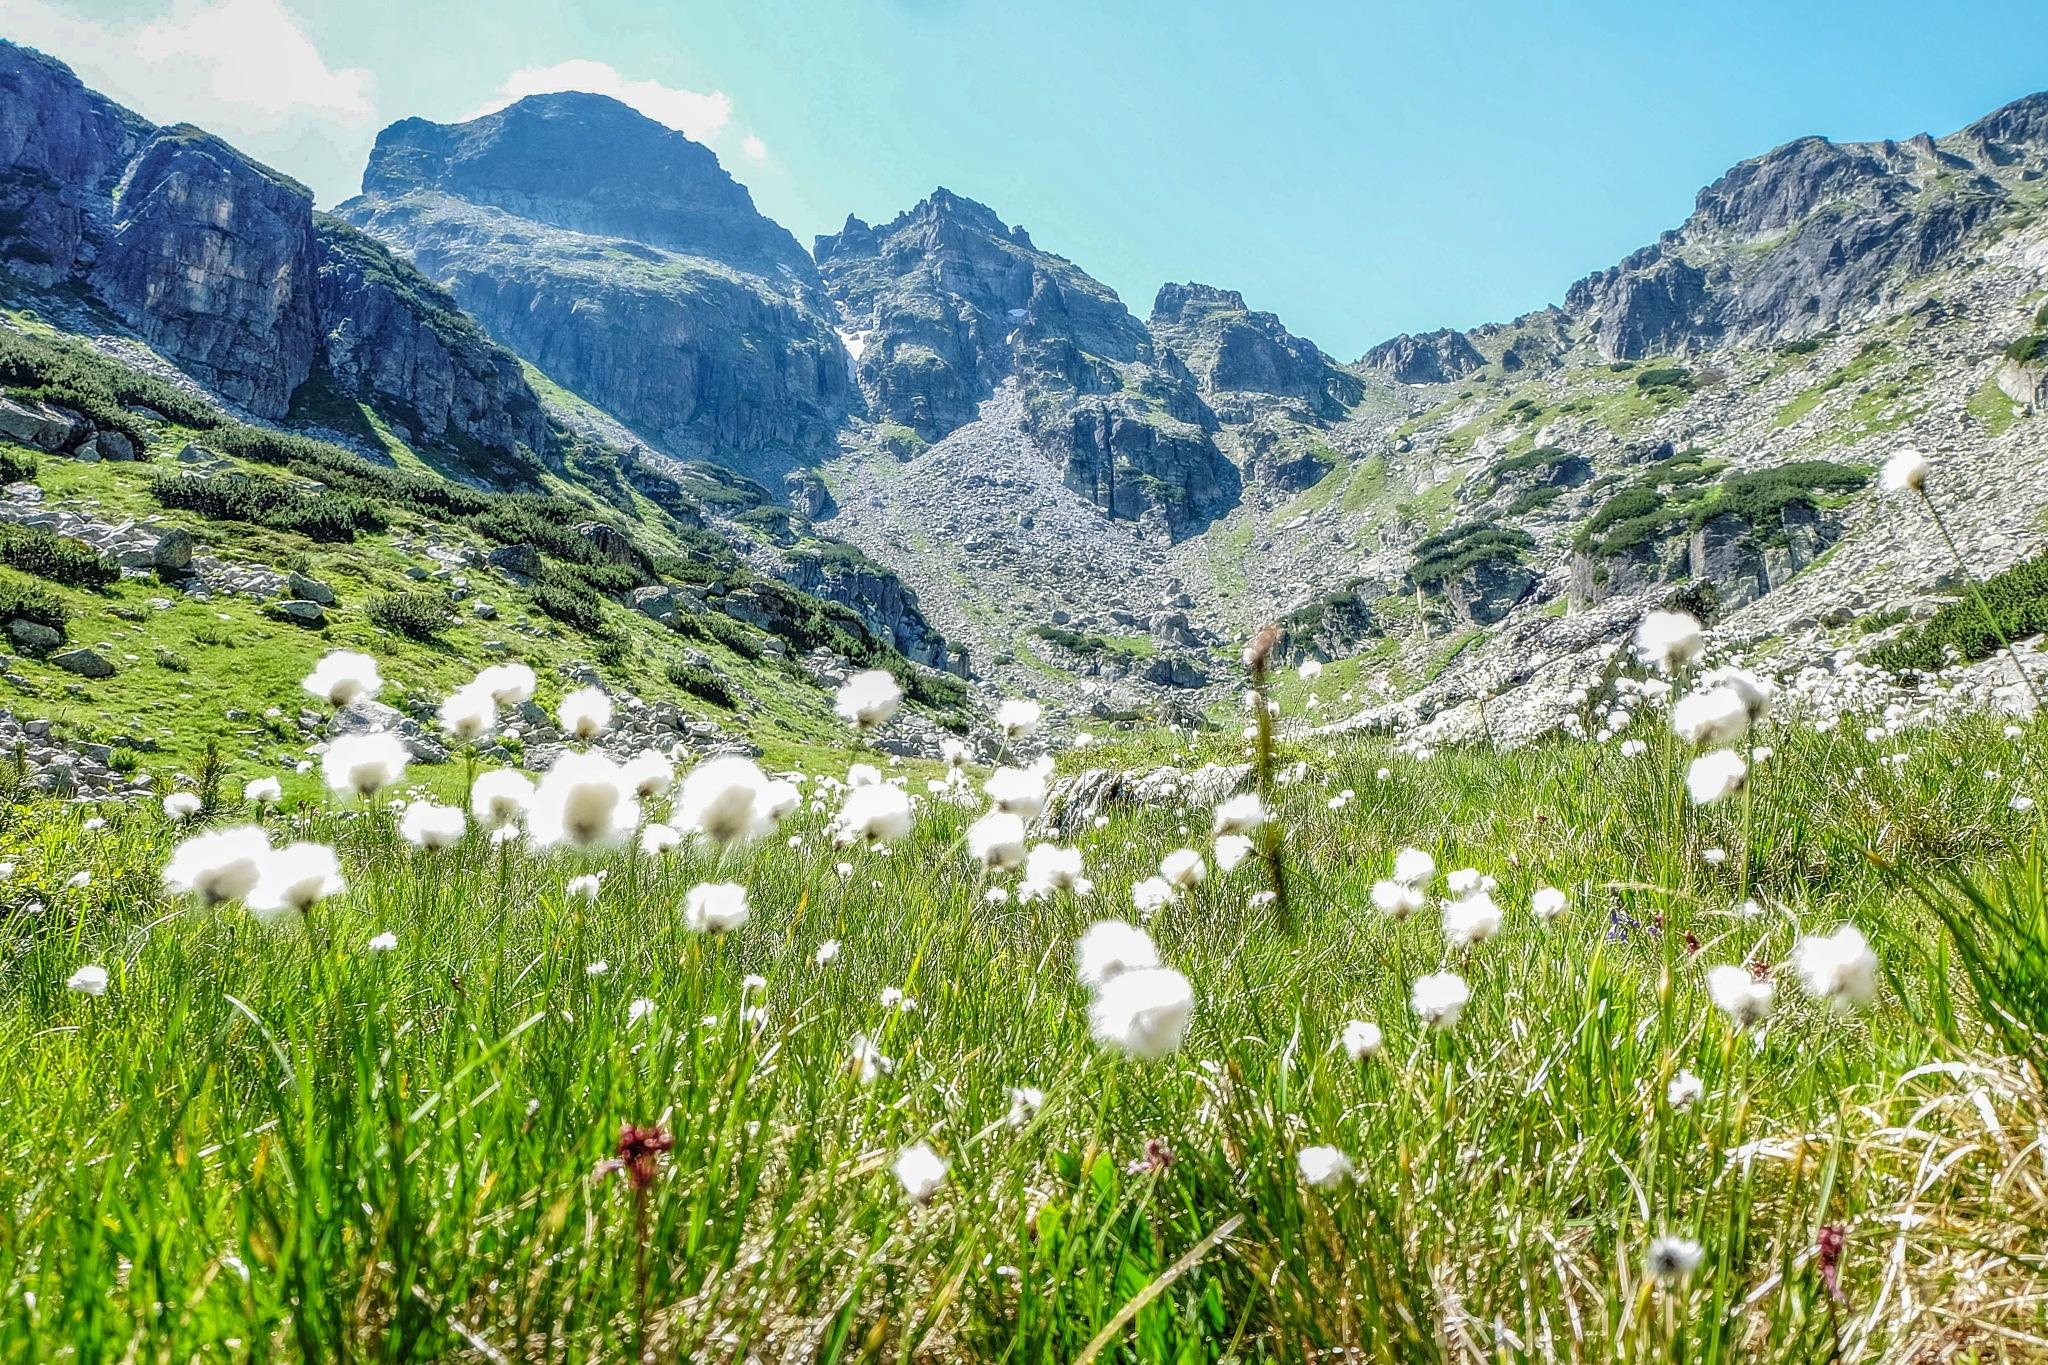 Sumer in Rila mountain by Hristo Dechev